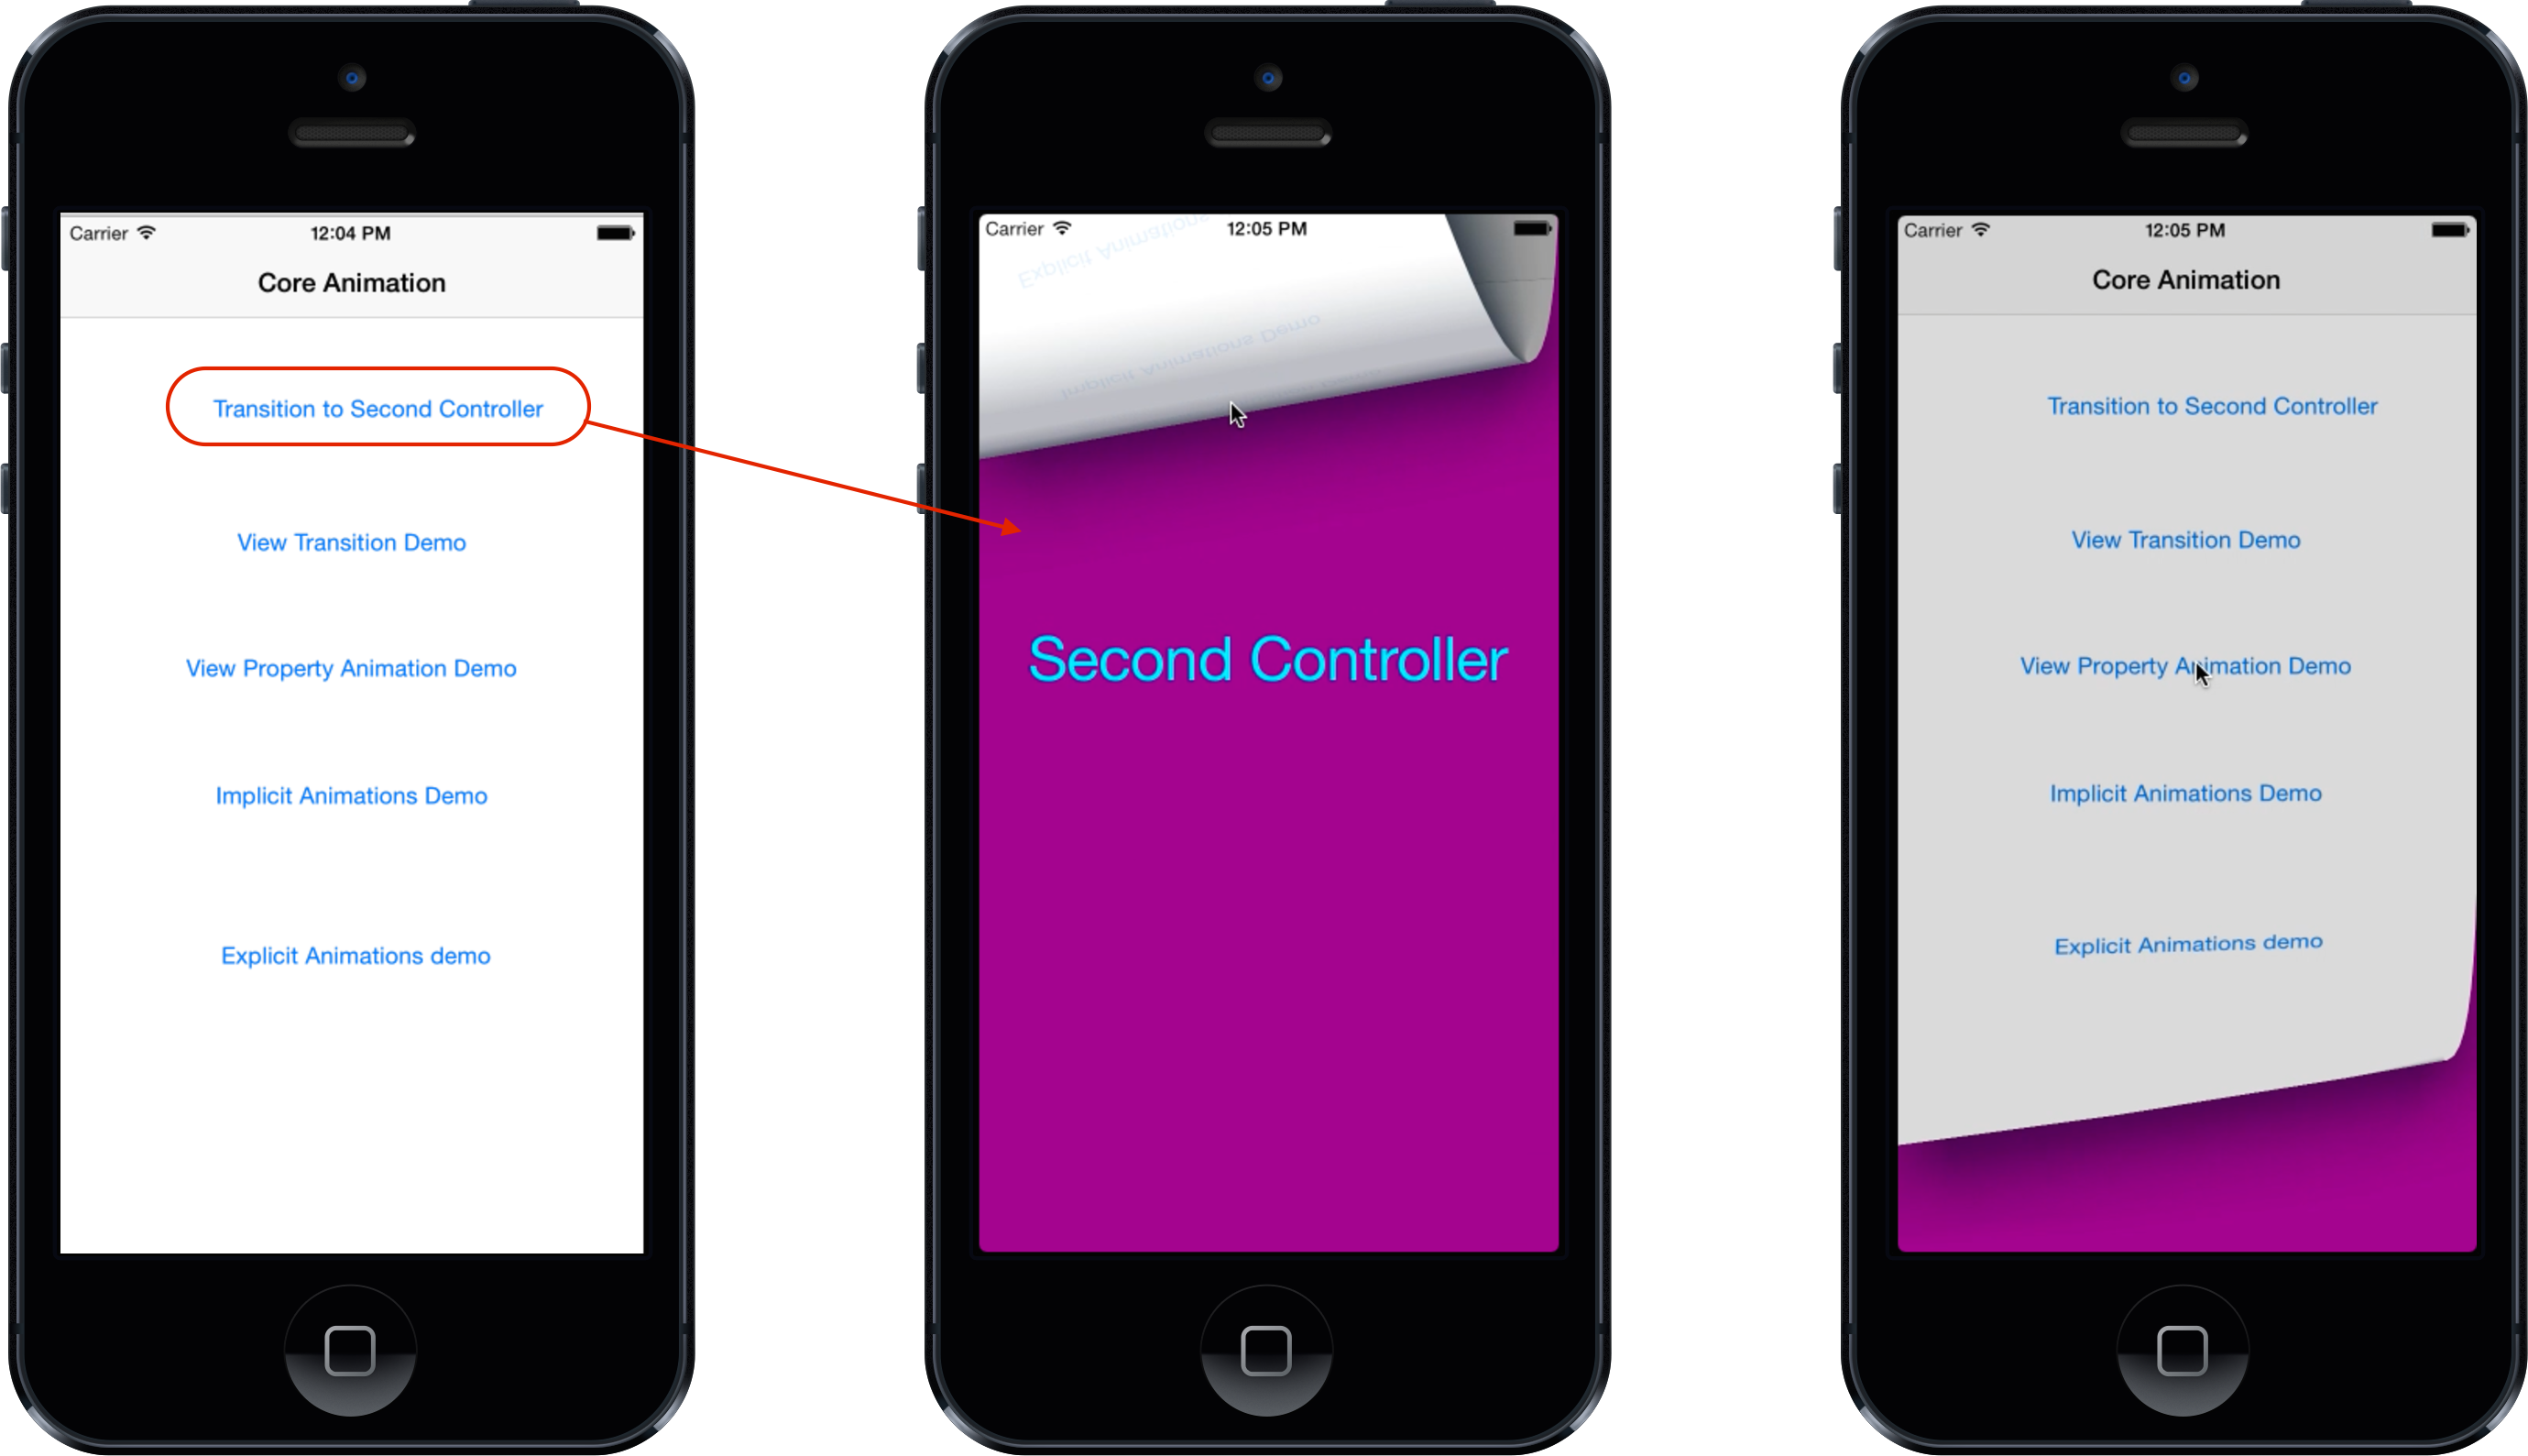 Core Animation in Xamarin iOS - Xamarin | Microsoft Docs